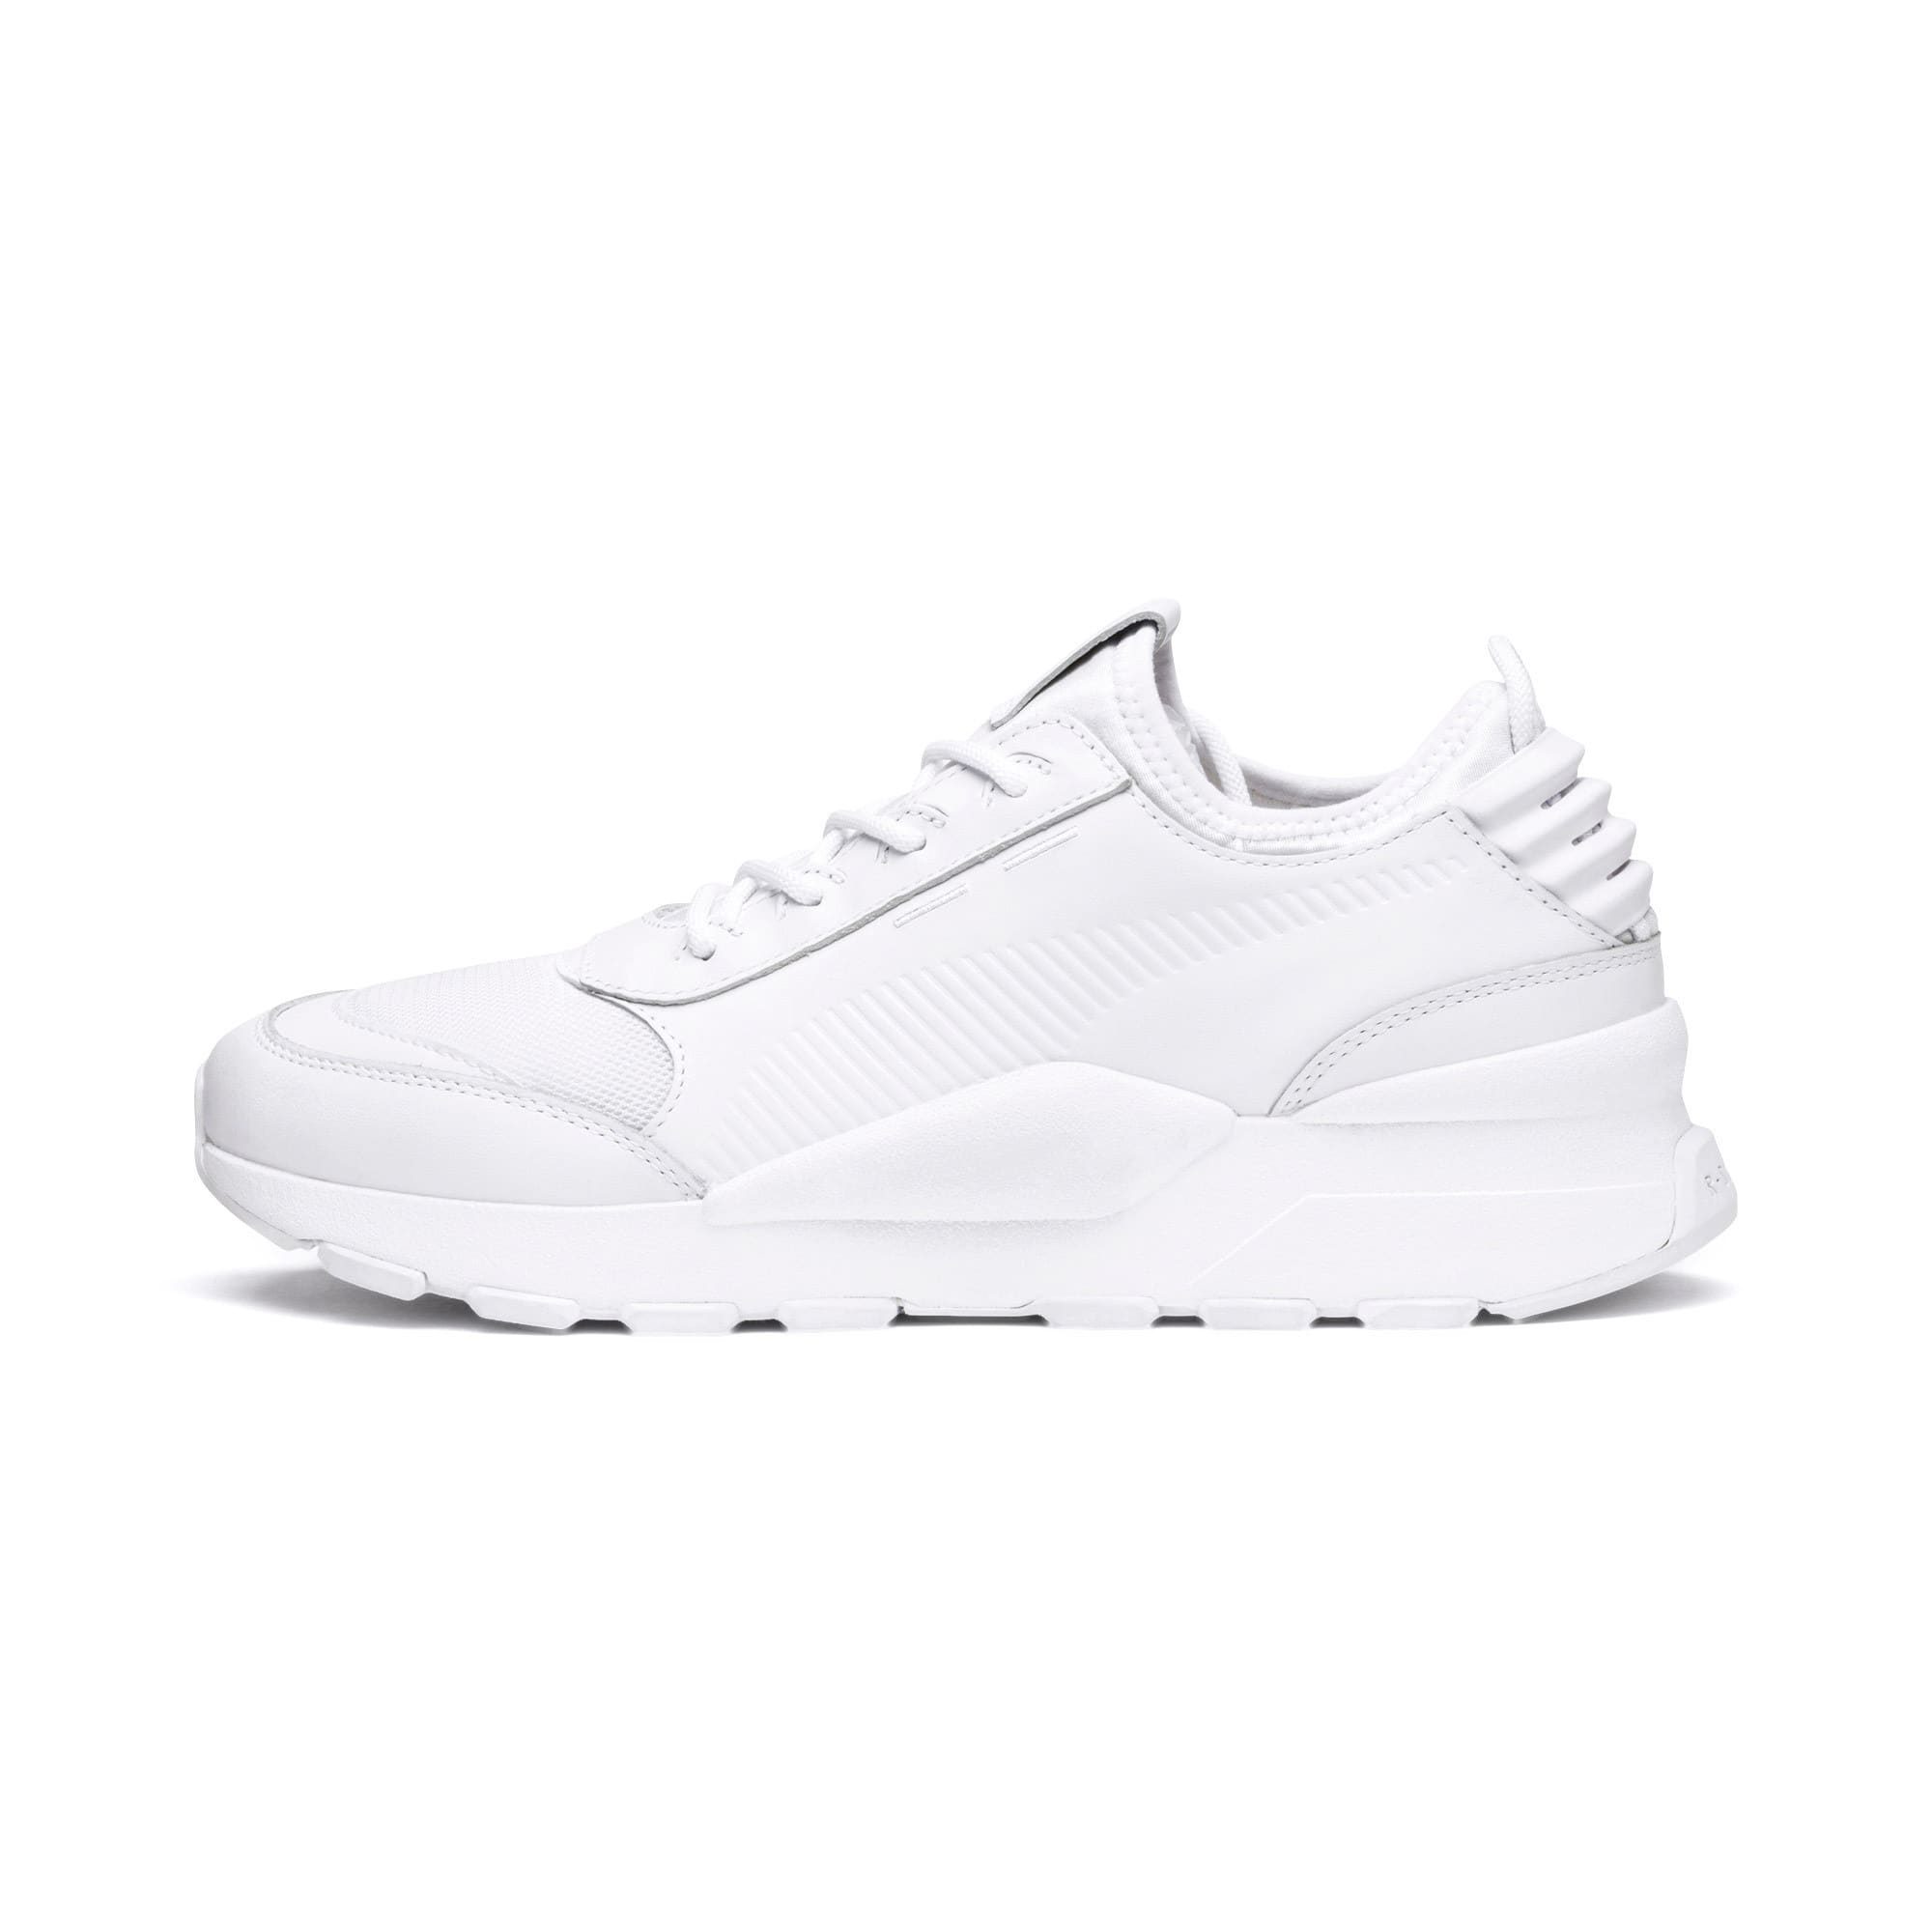 Thumbnail 1 of Evolution RS-0 SOUND sneakers, Puma White, medium